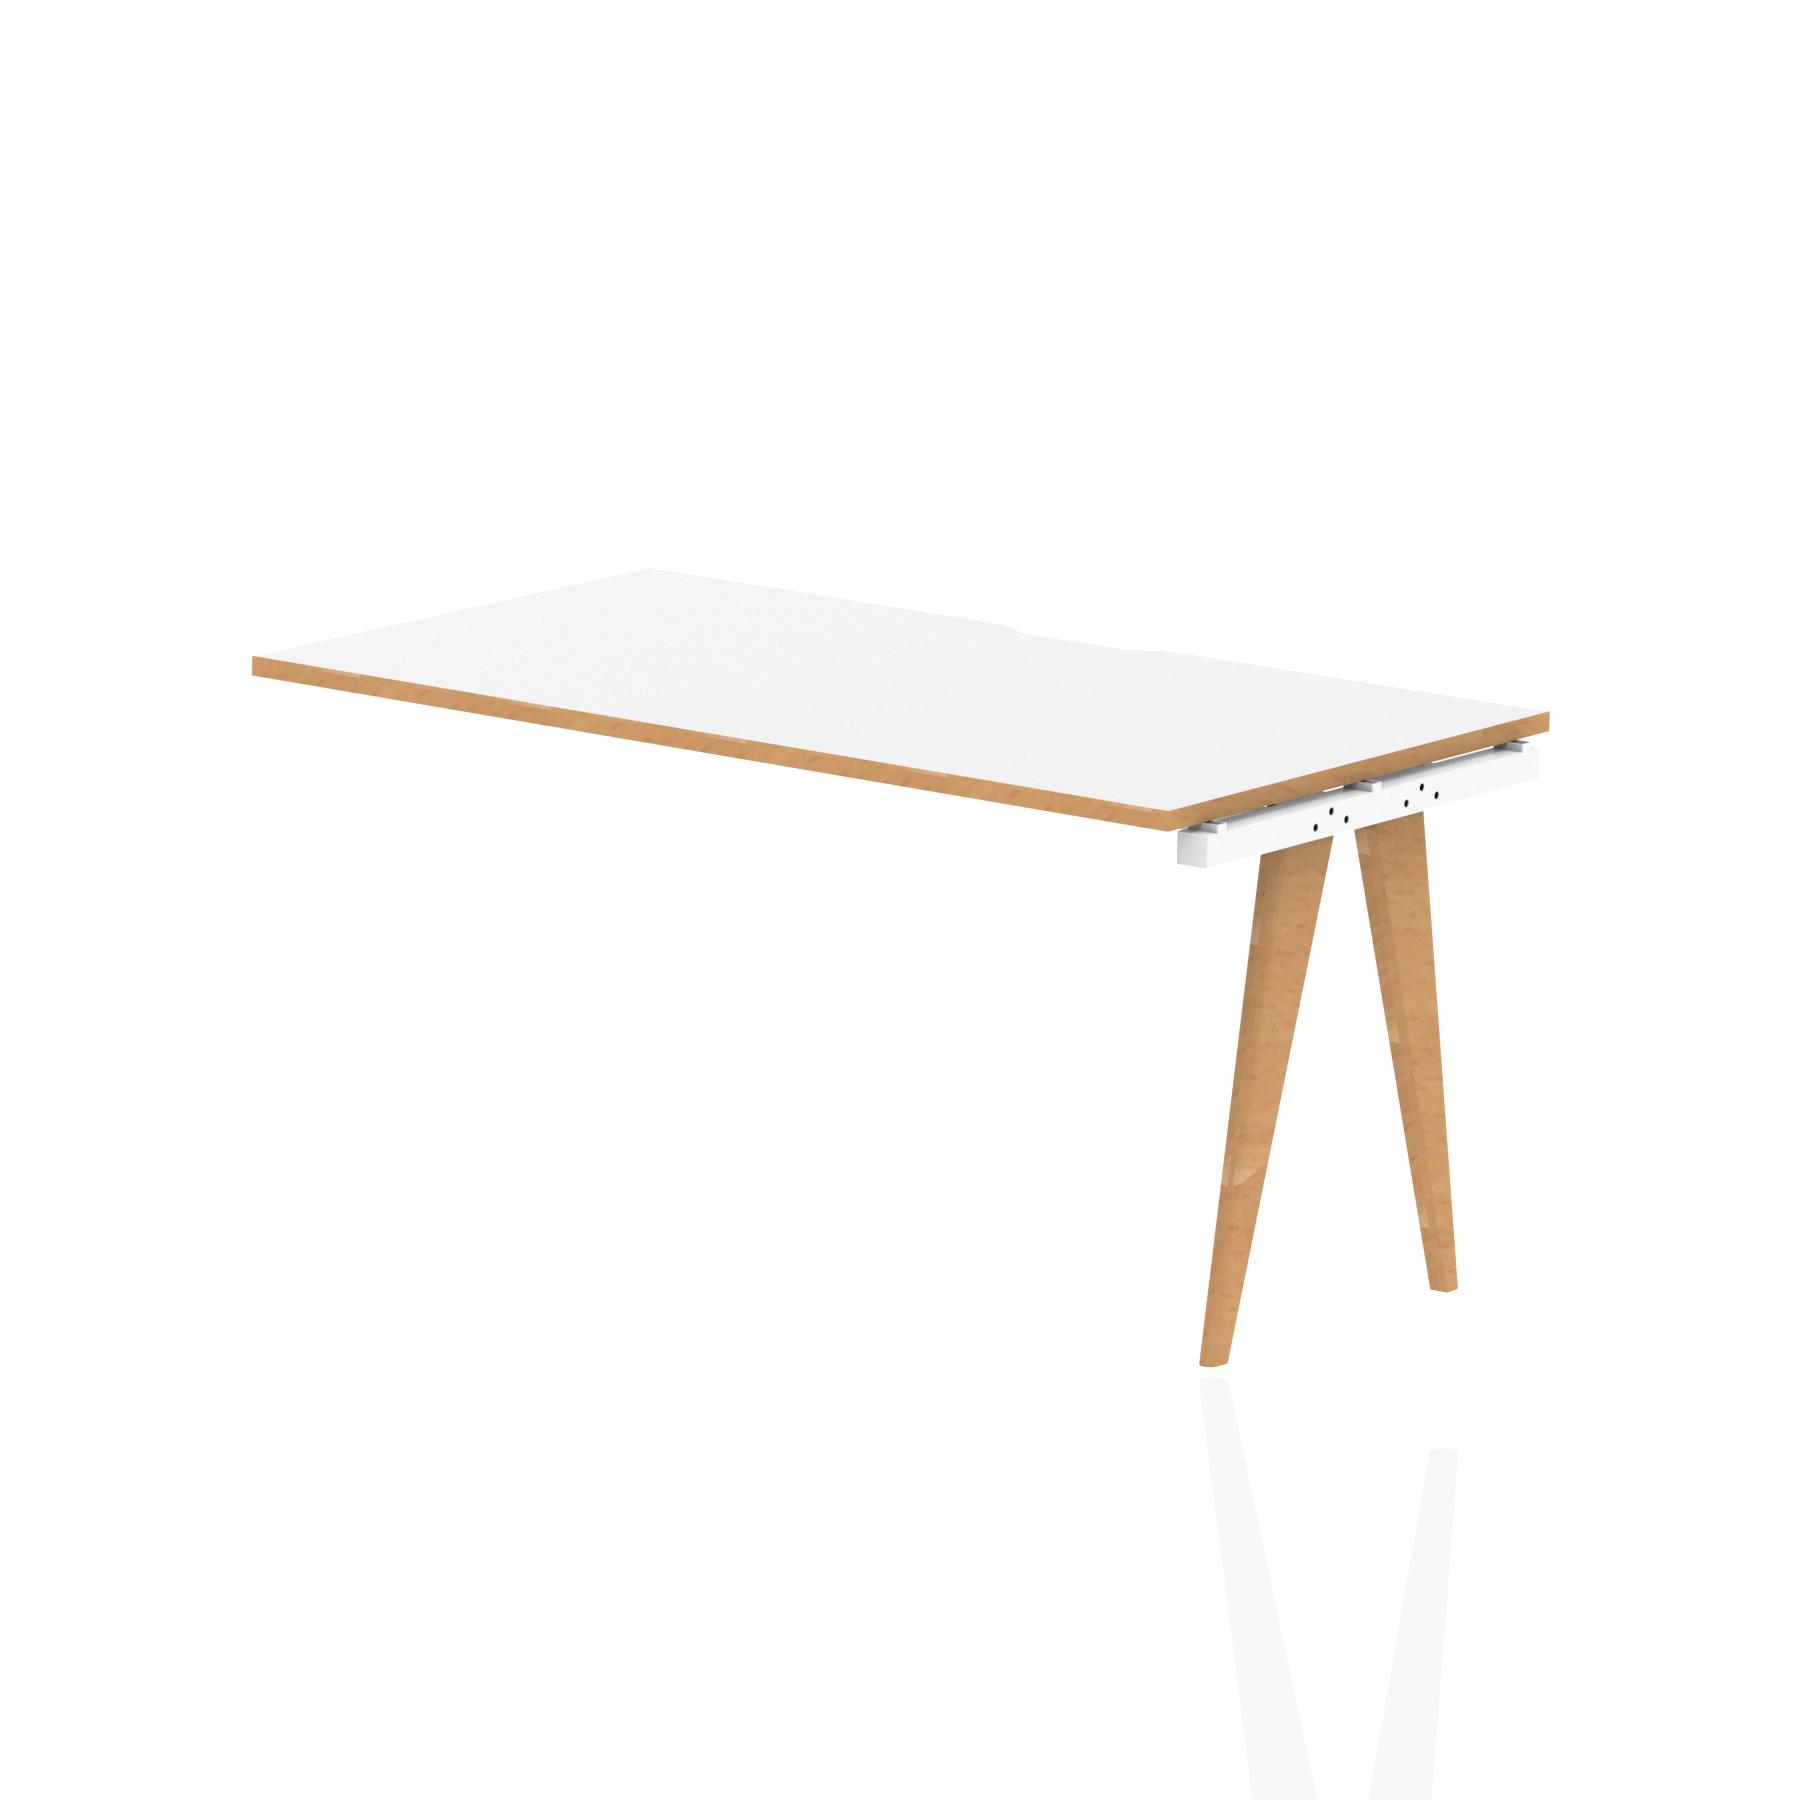 Oslo Single Ext Kit White Frame Wooden Leg Bench Desk 1400 White With Natural Wood Edge